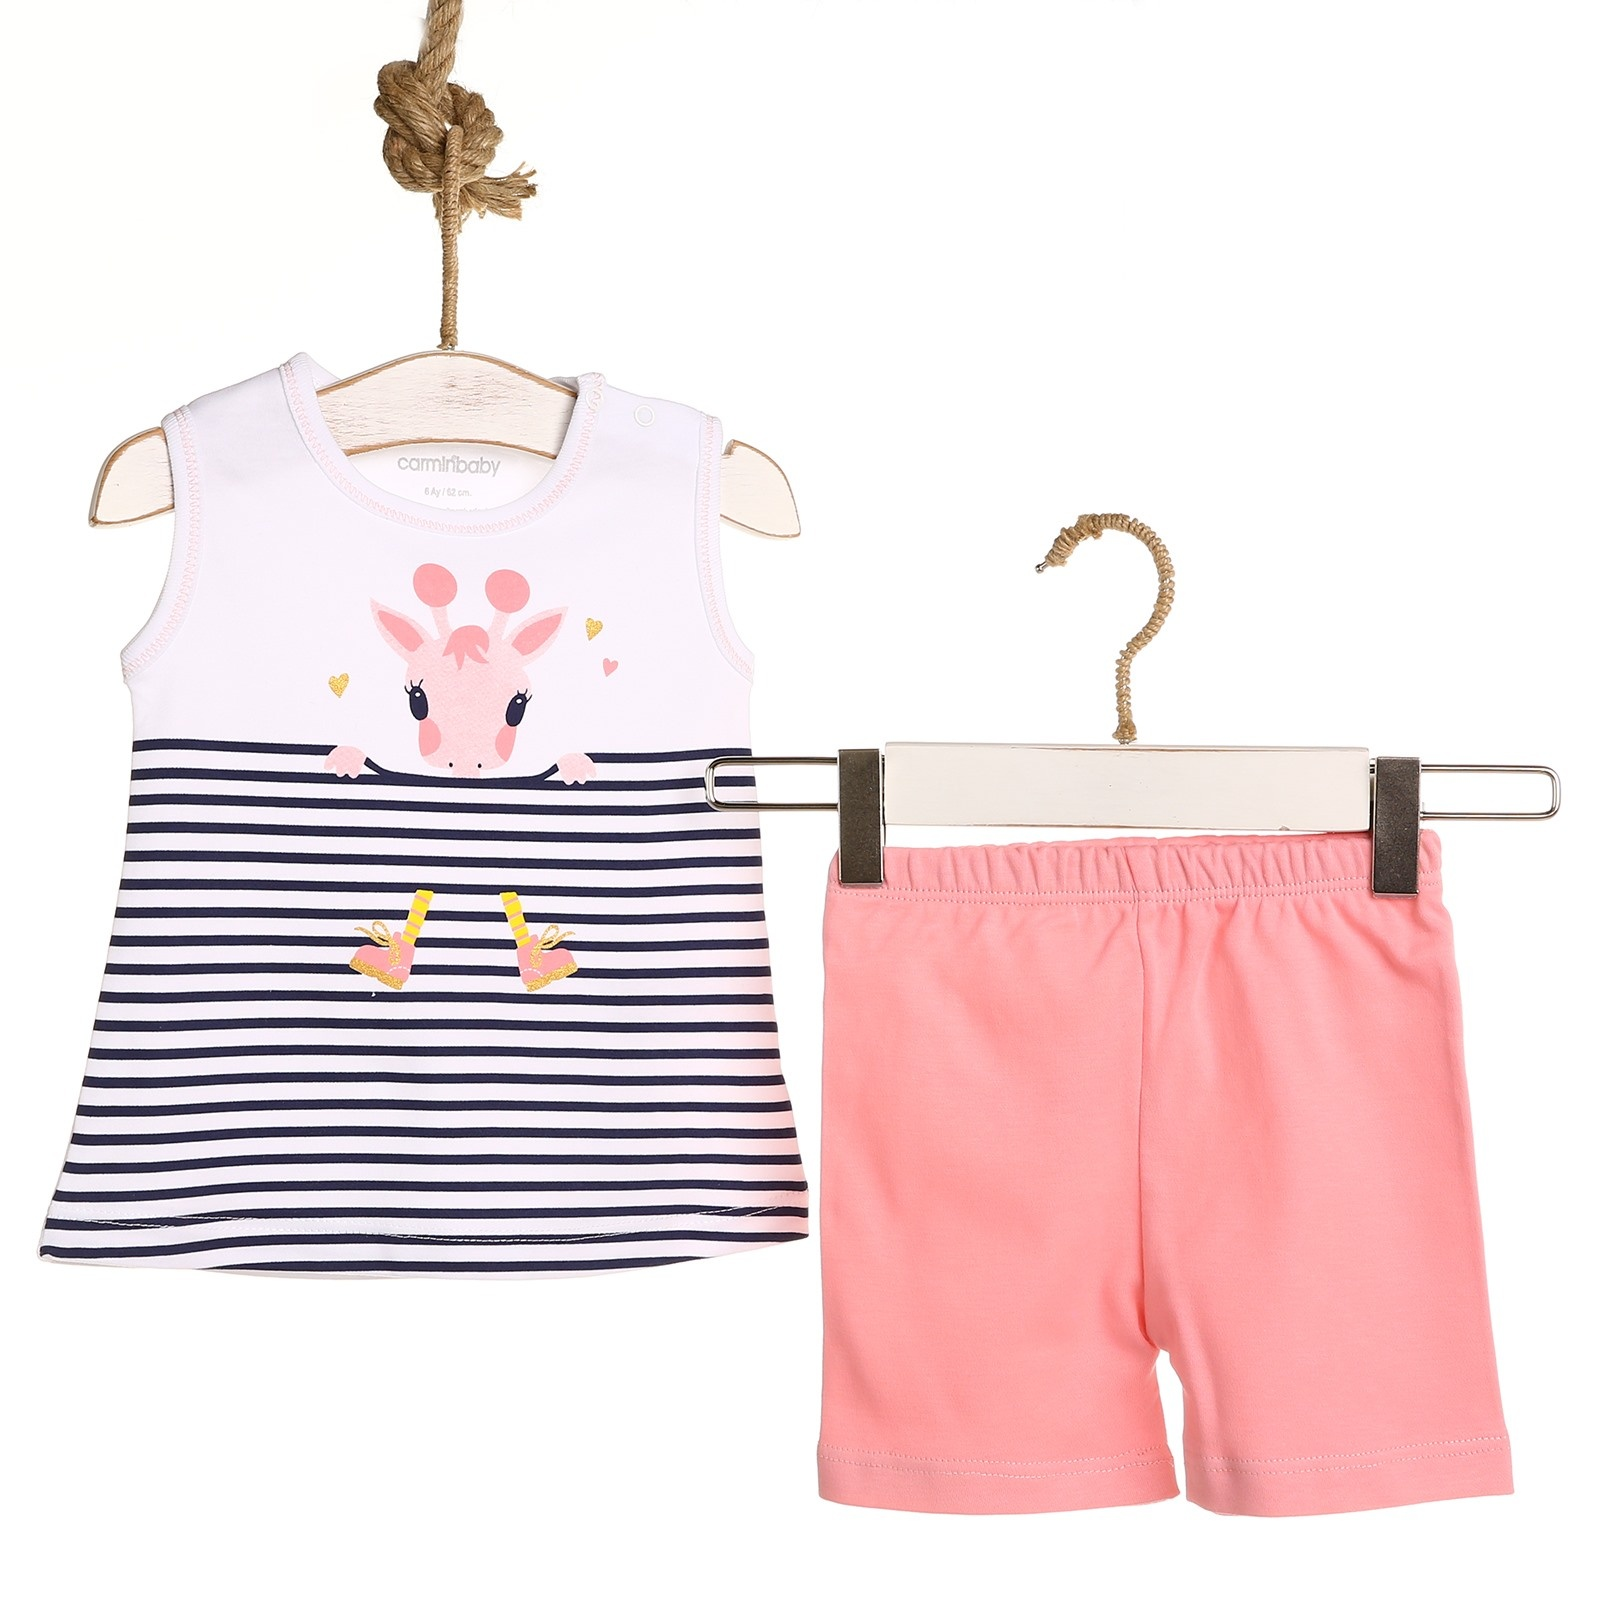 Ebebek Carmin Baby Striped Girl Athlete Short